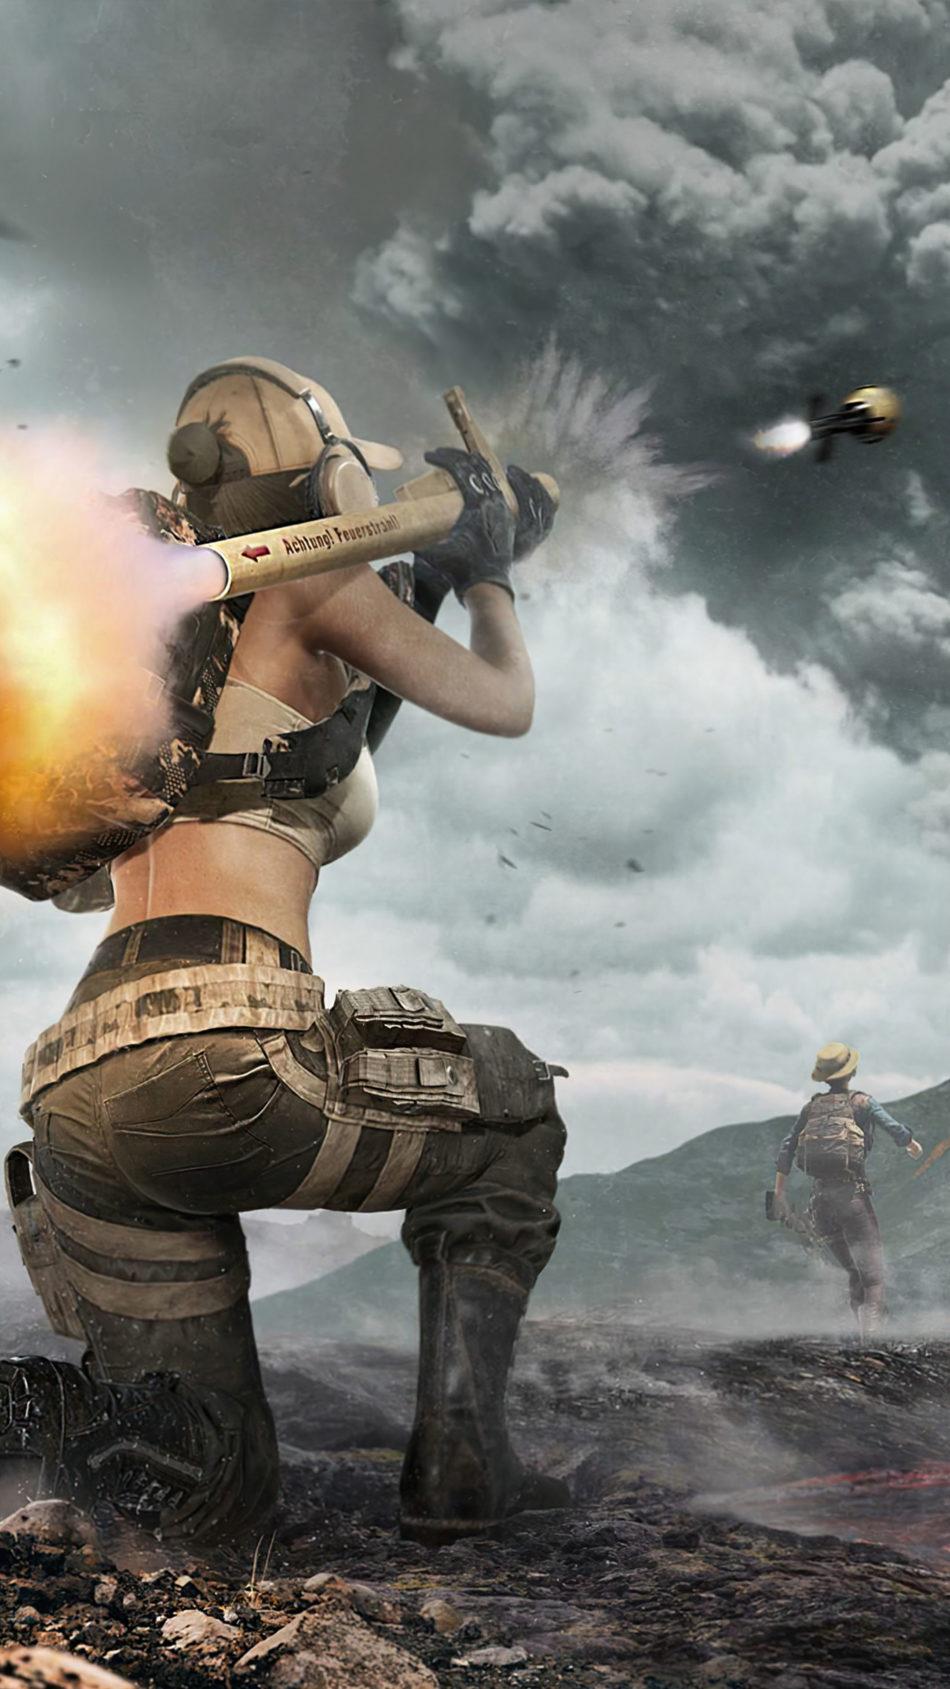 PUBG Girl Rocket Launcher Open World Fight 4K Ultra HD Mobile Wallpaper